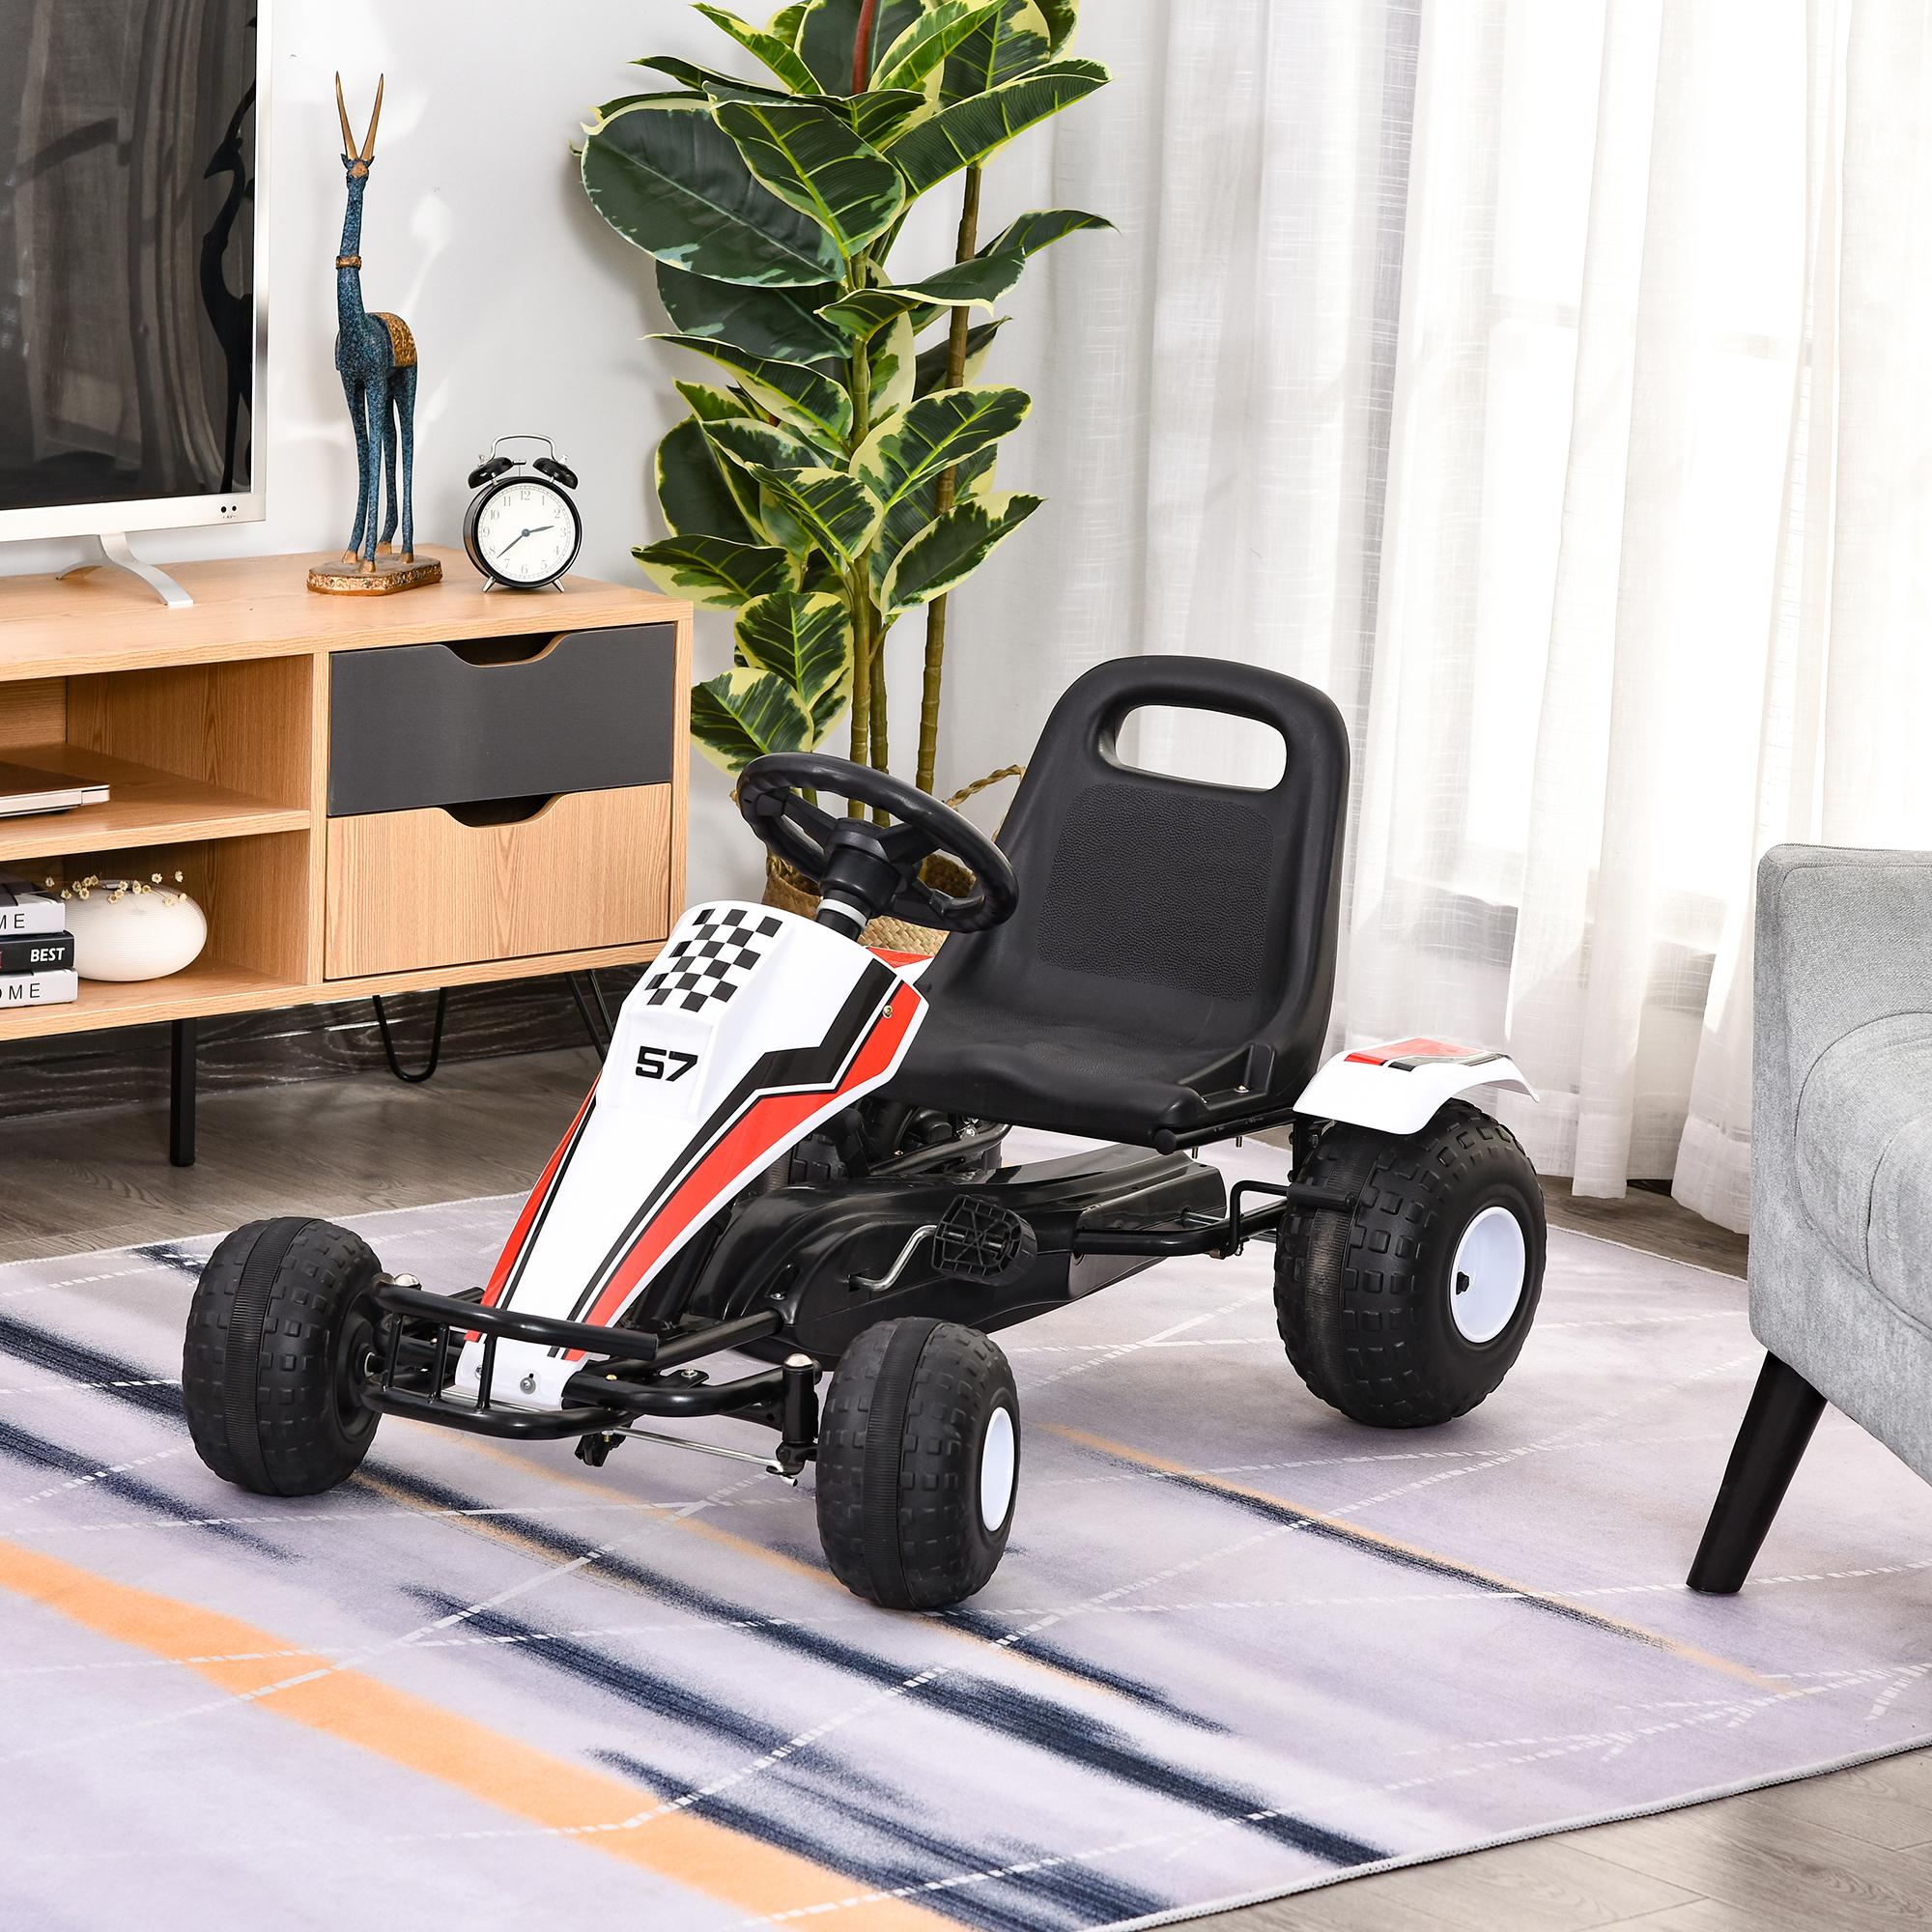 AchieveUSA Kids Powered 4 Wheel Adjustable Seat Pedal Go Kart-Red